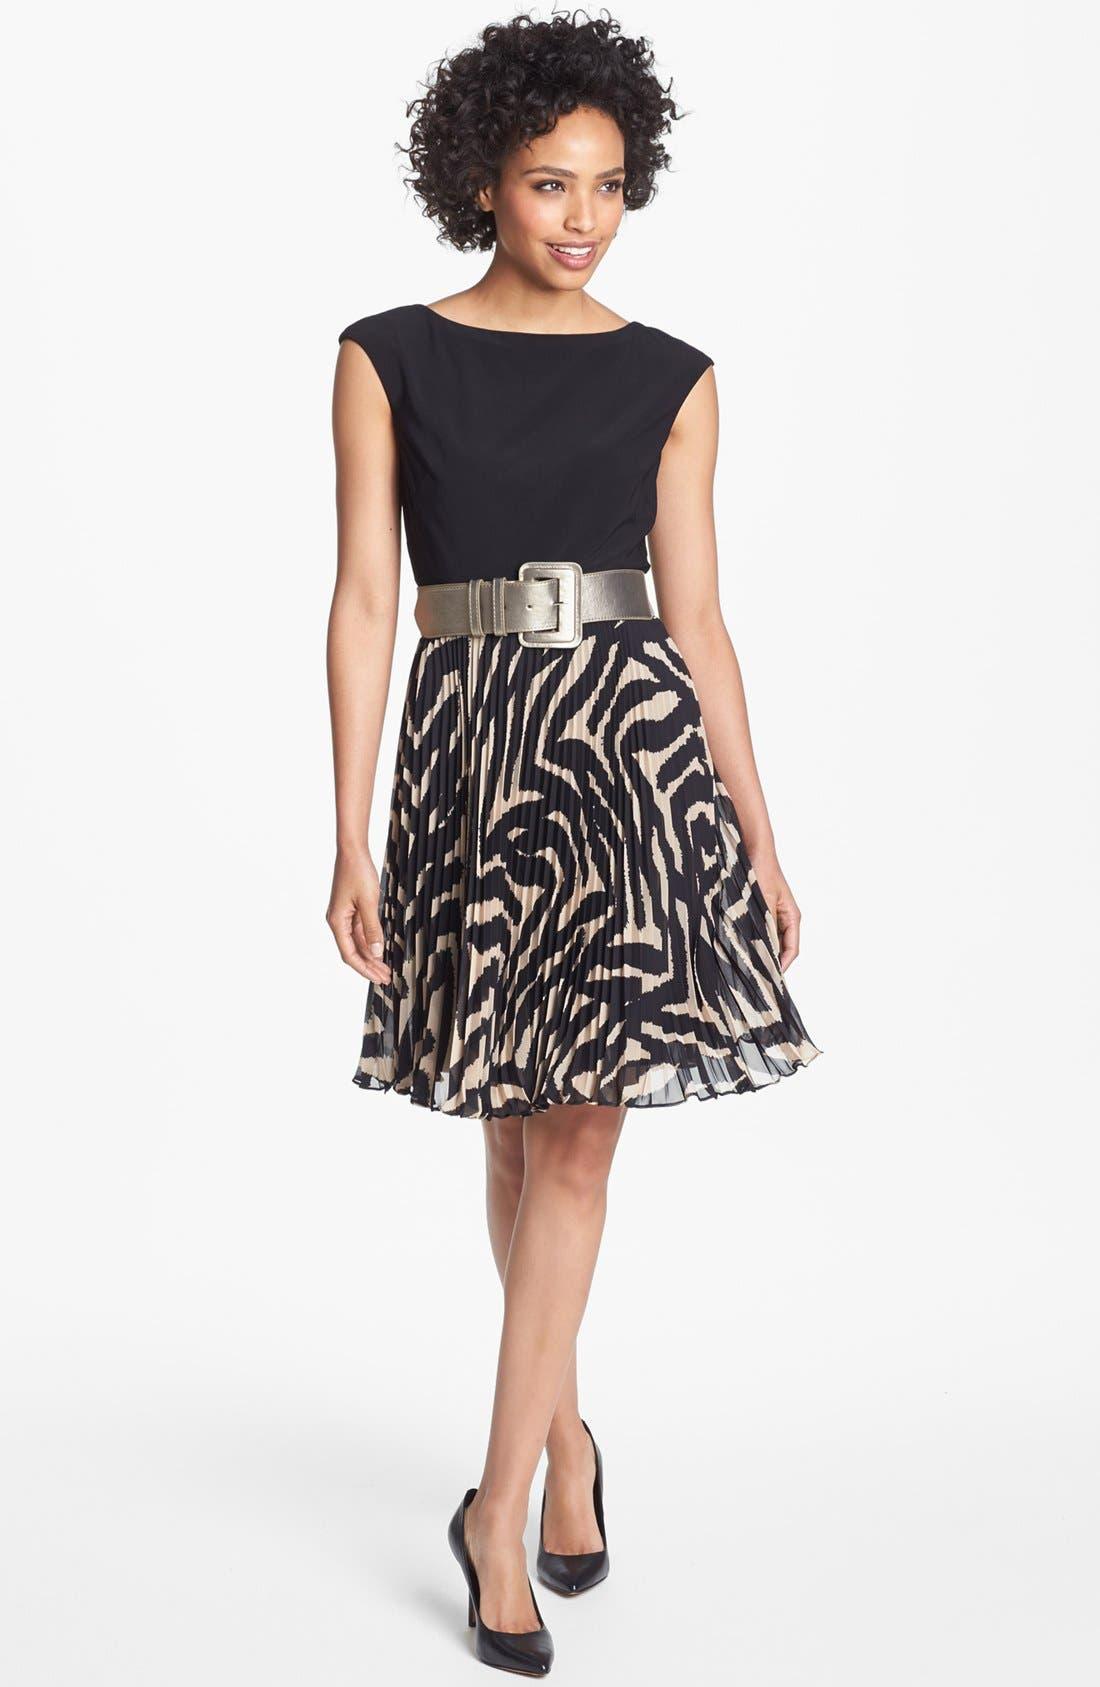 Alternate Image 1 Selected - Eliza J Mixed Media Fit & Flare Dress